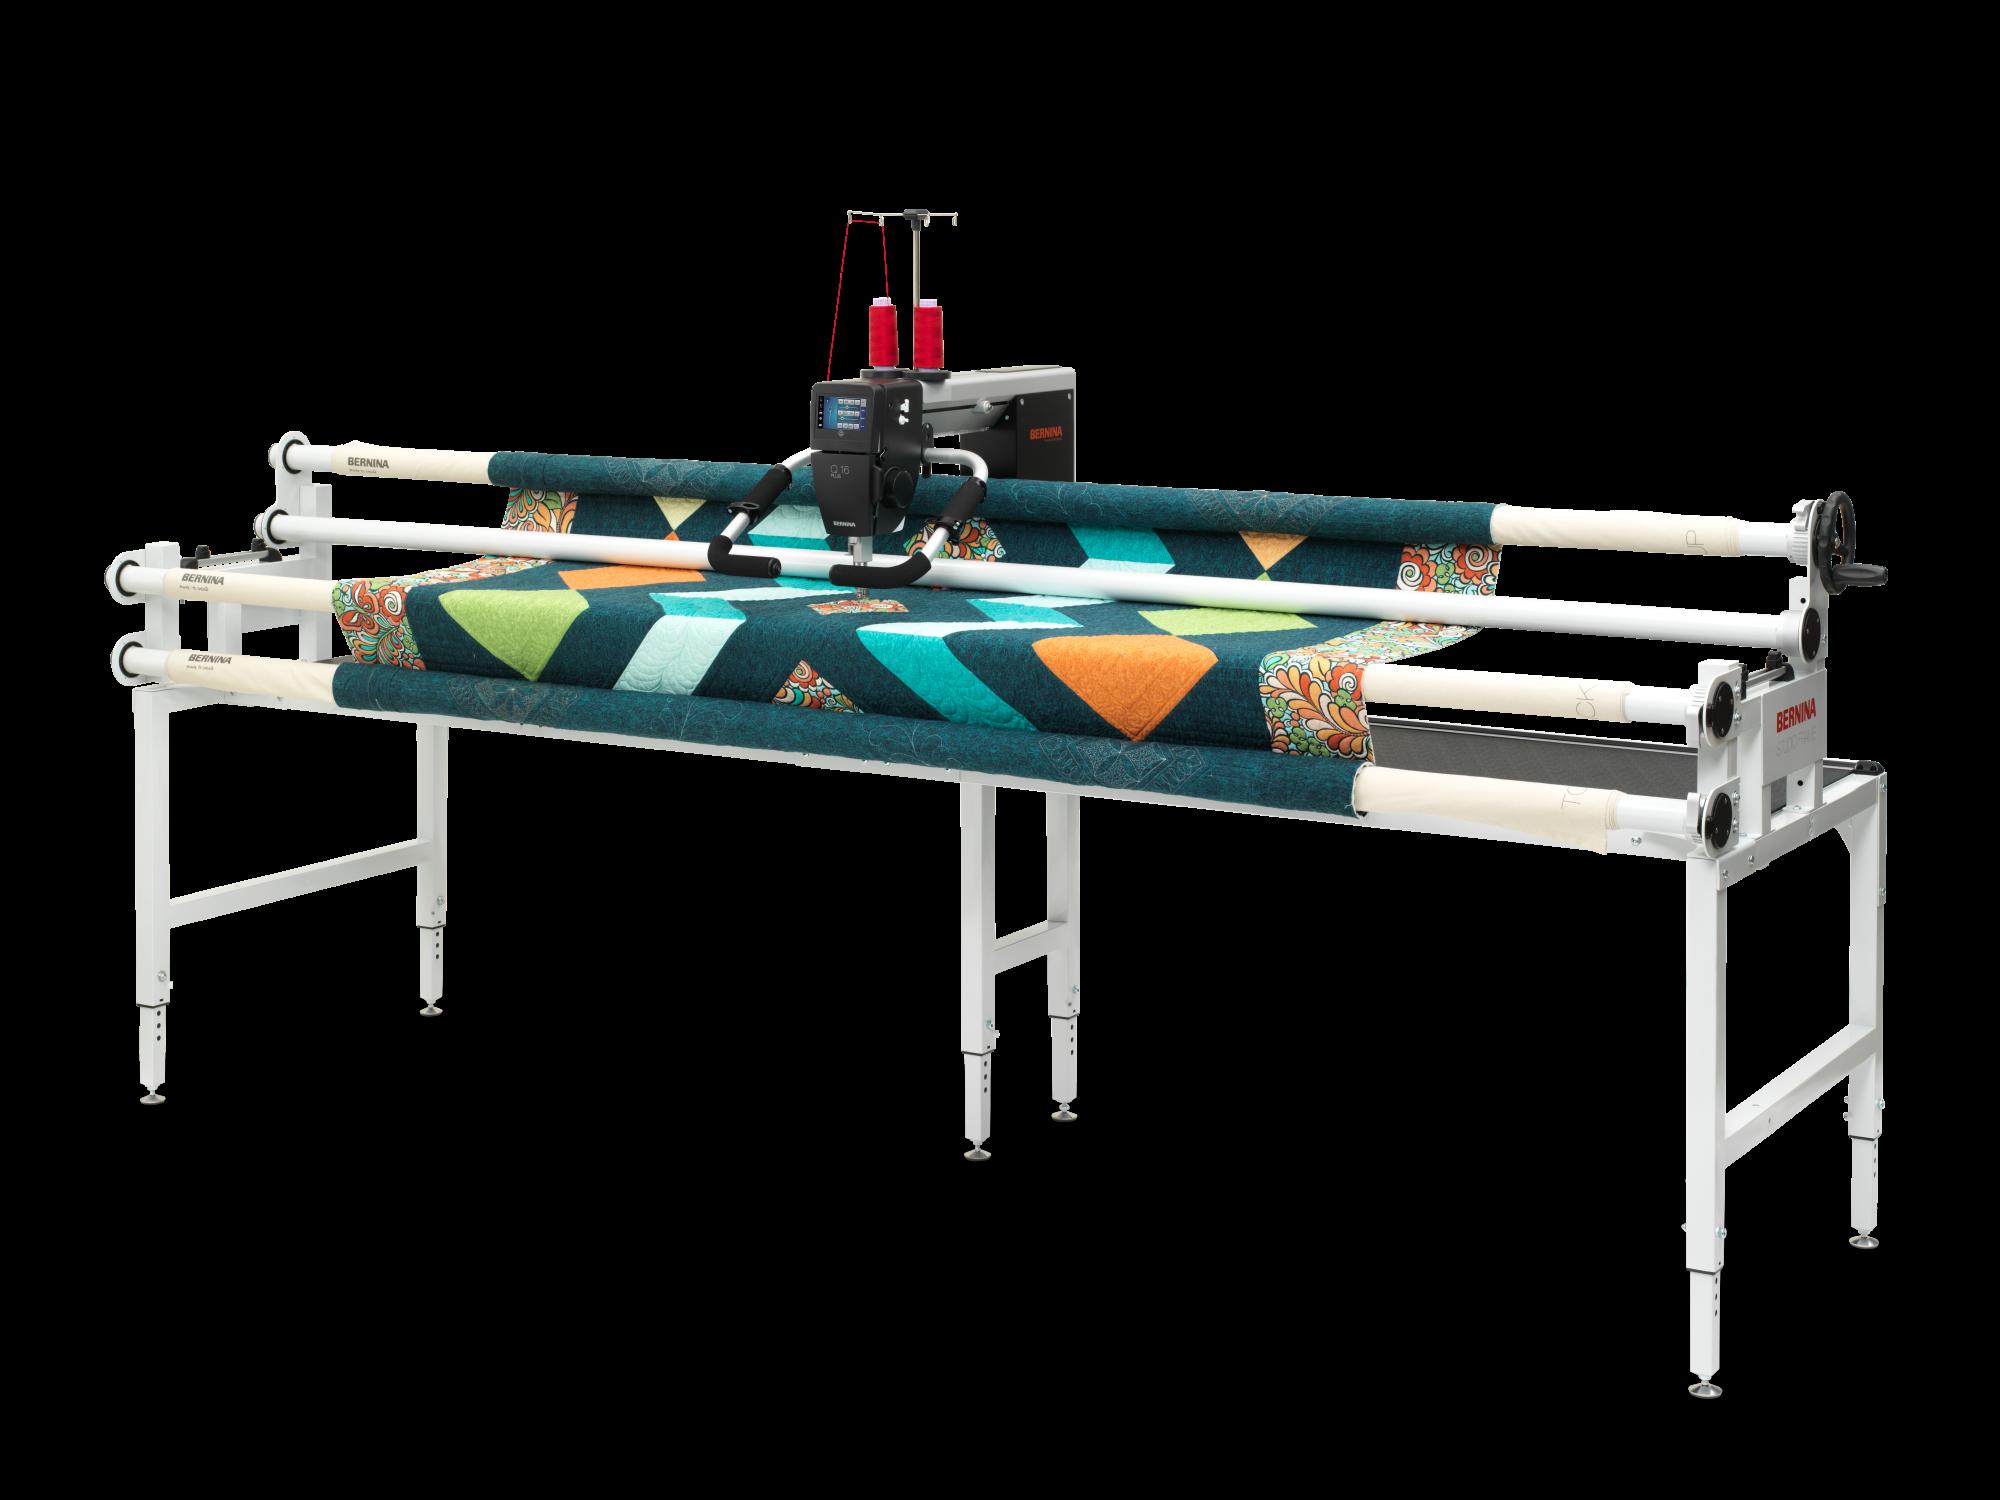 Bernina Q16 PLUS Long Arm Quilter With 10 Studio Frame